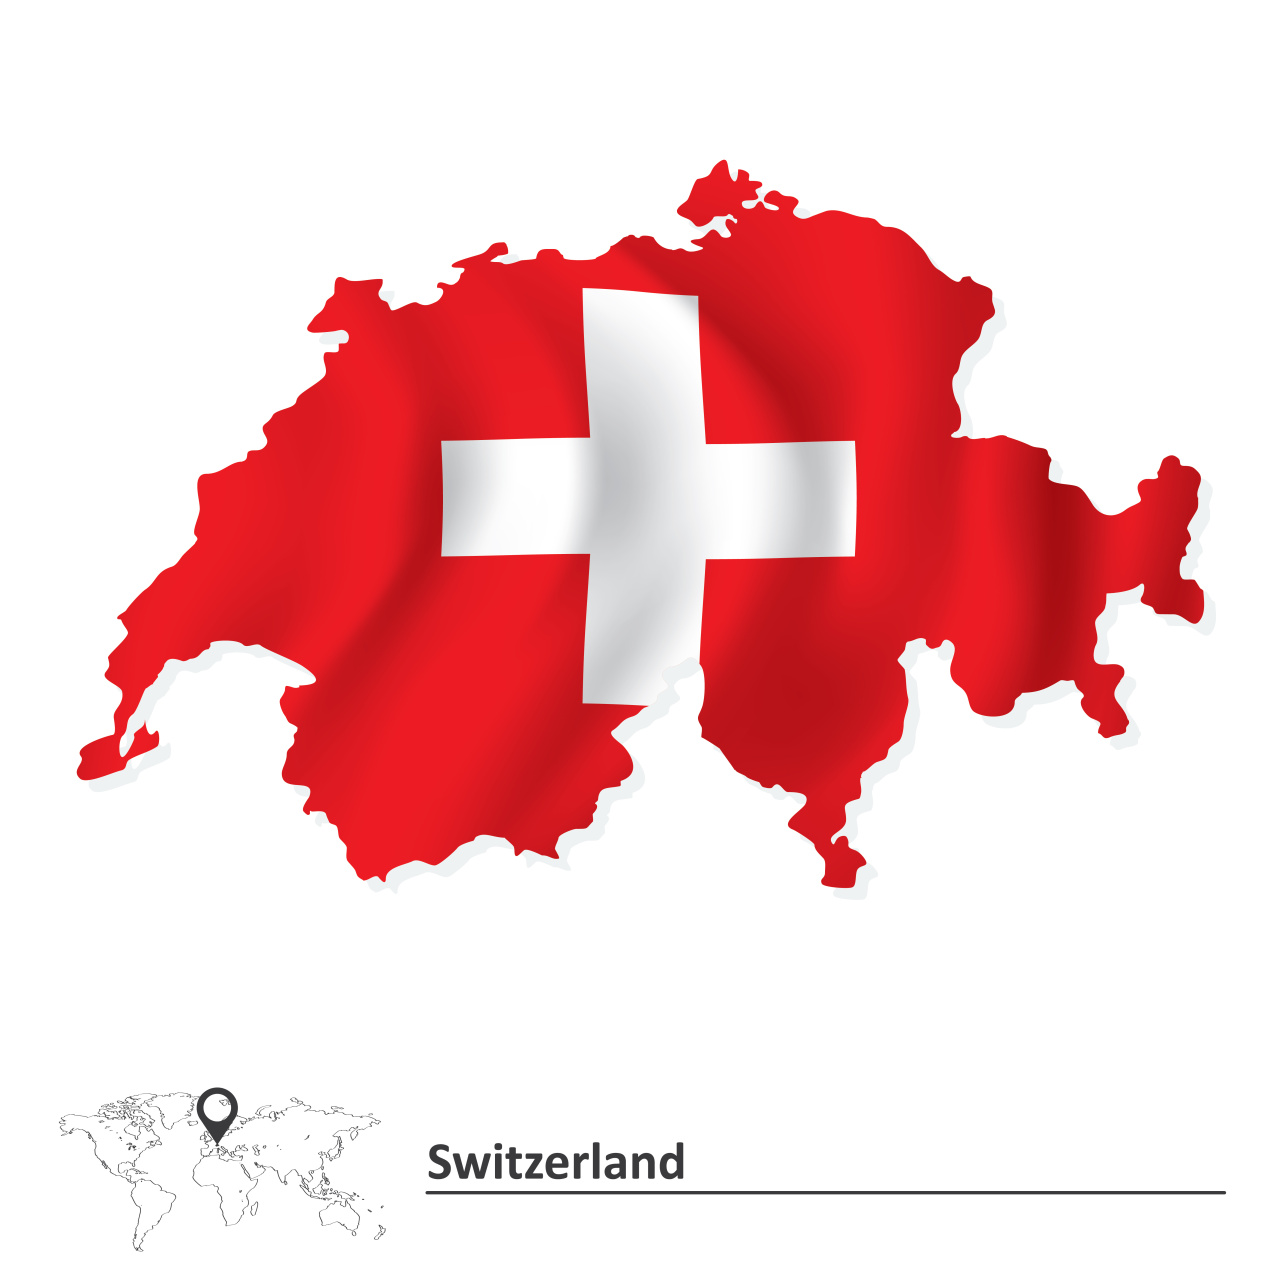 The flag of Switzerland (123rf)